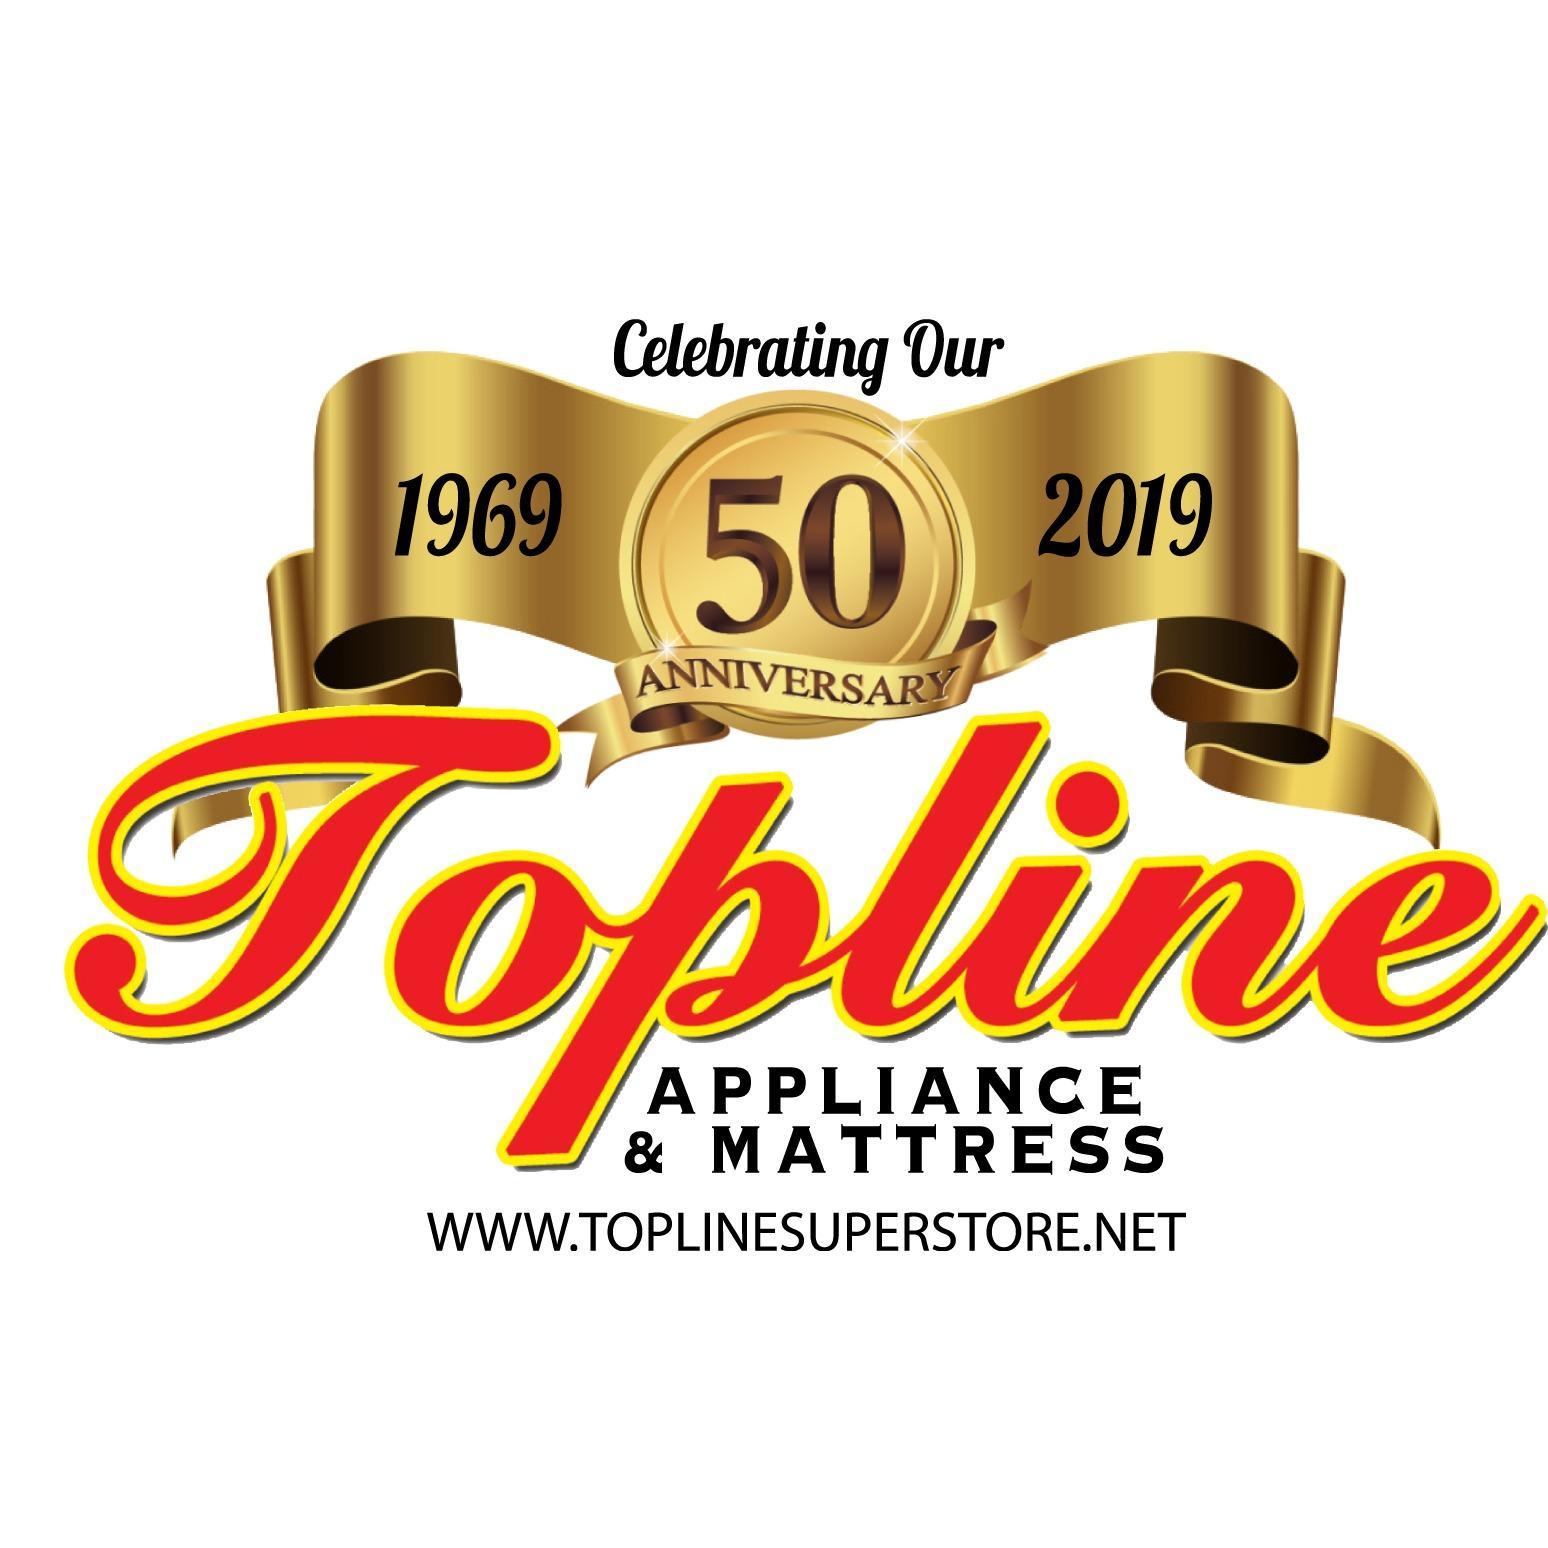 Topline Appliance and Mattress - West Melbourne, FL 32904 - (321)768-9700 | ShowMeLocal.com